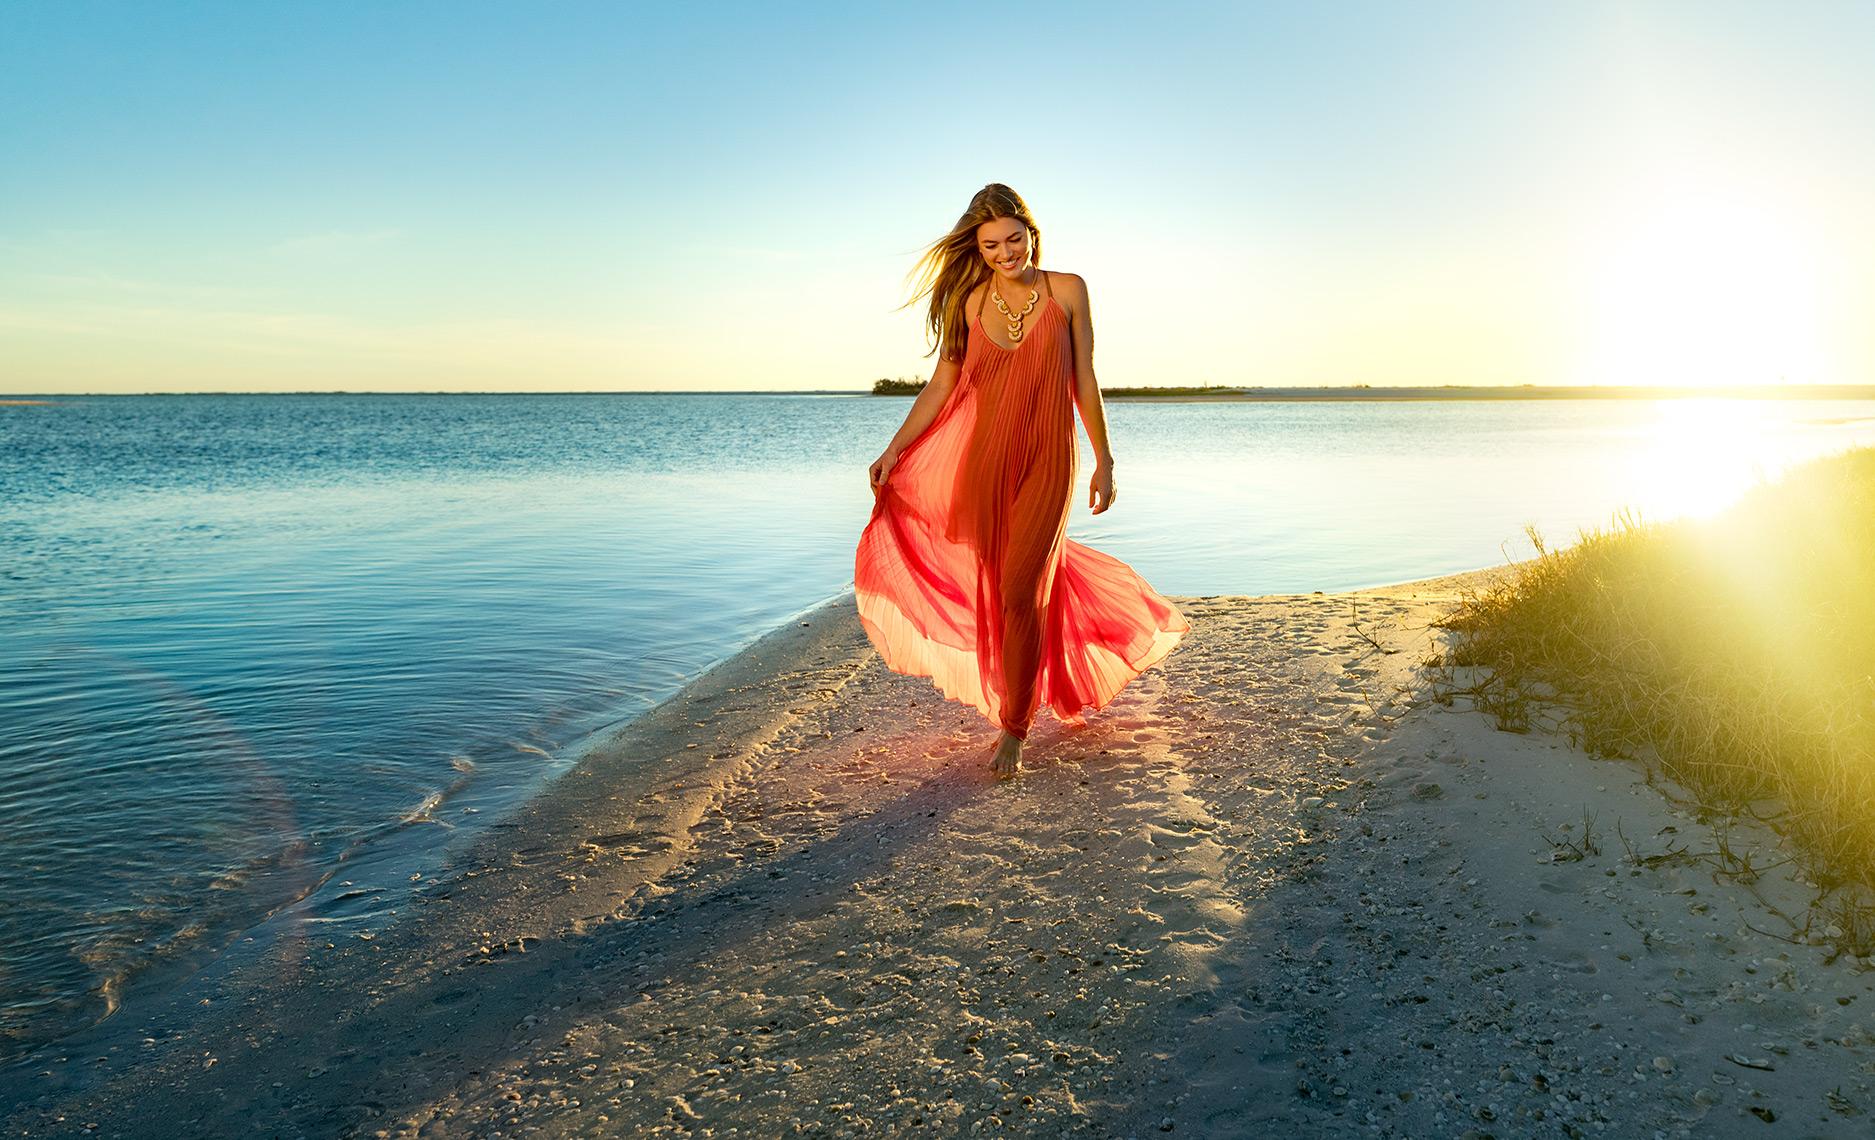 07_Sunset_Beach_TigerTails_Day1_Caucasian_Mil_11273-1.jpg